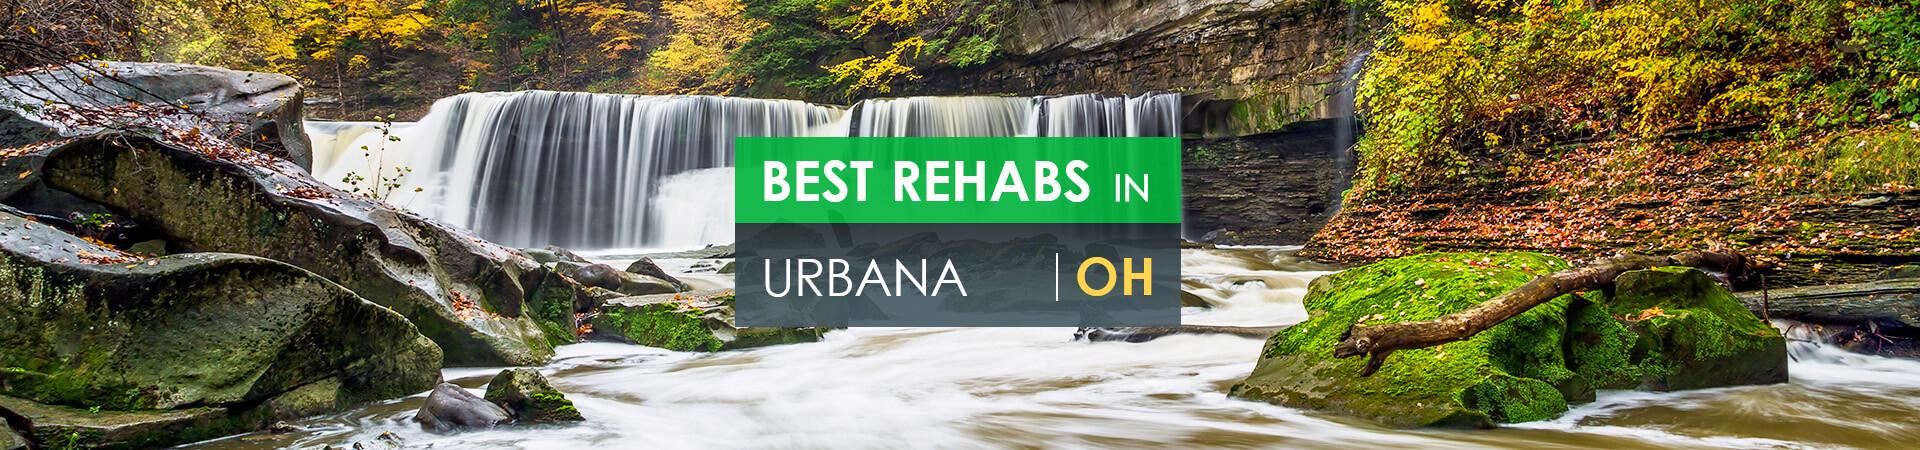 Best rehabs in Urbana, OH